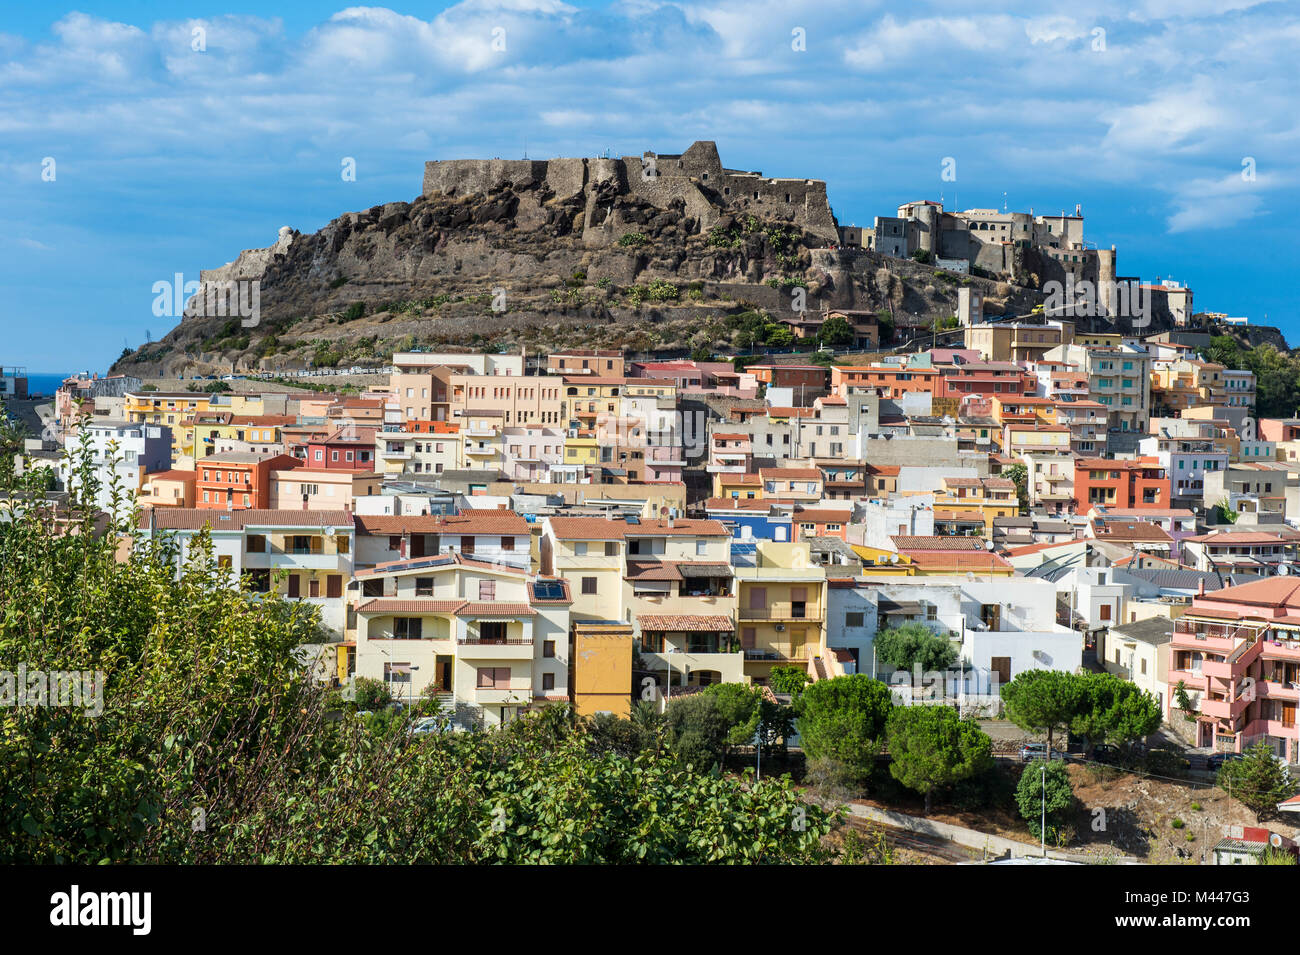 Overlook over Castelsardo,Sardinia,Italy - Stock Image